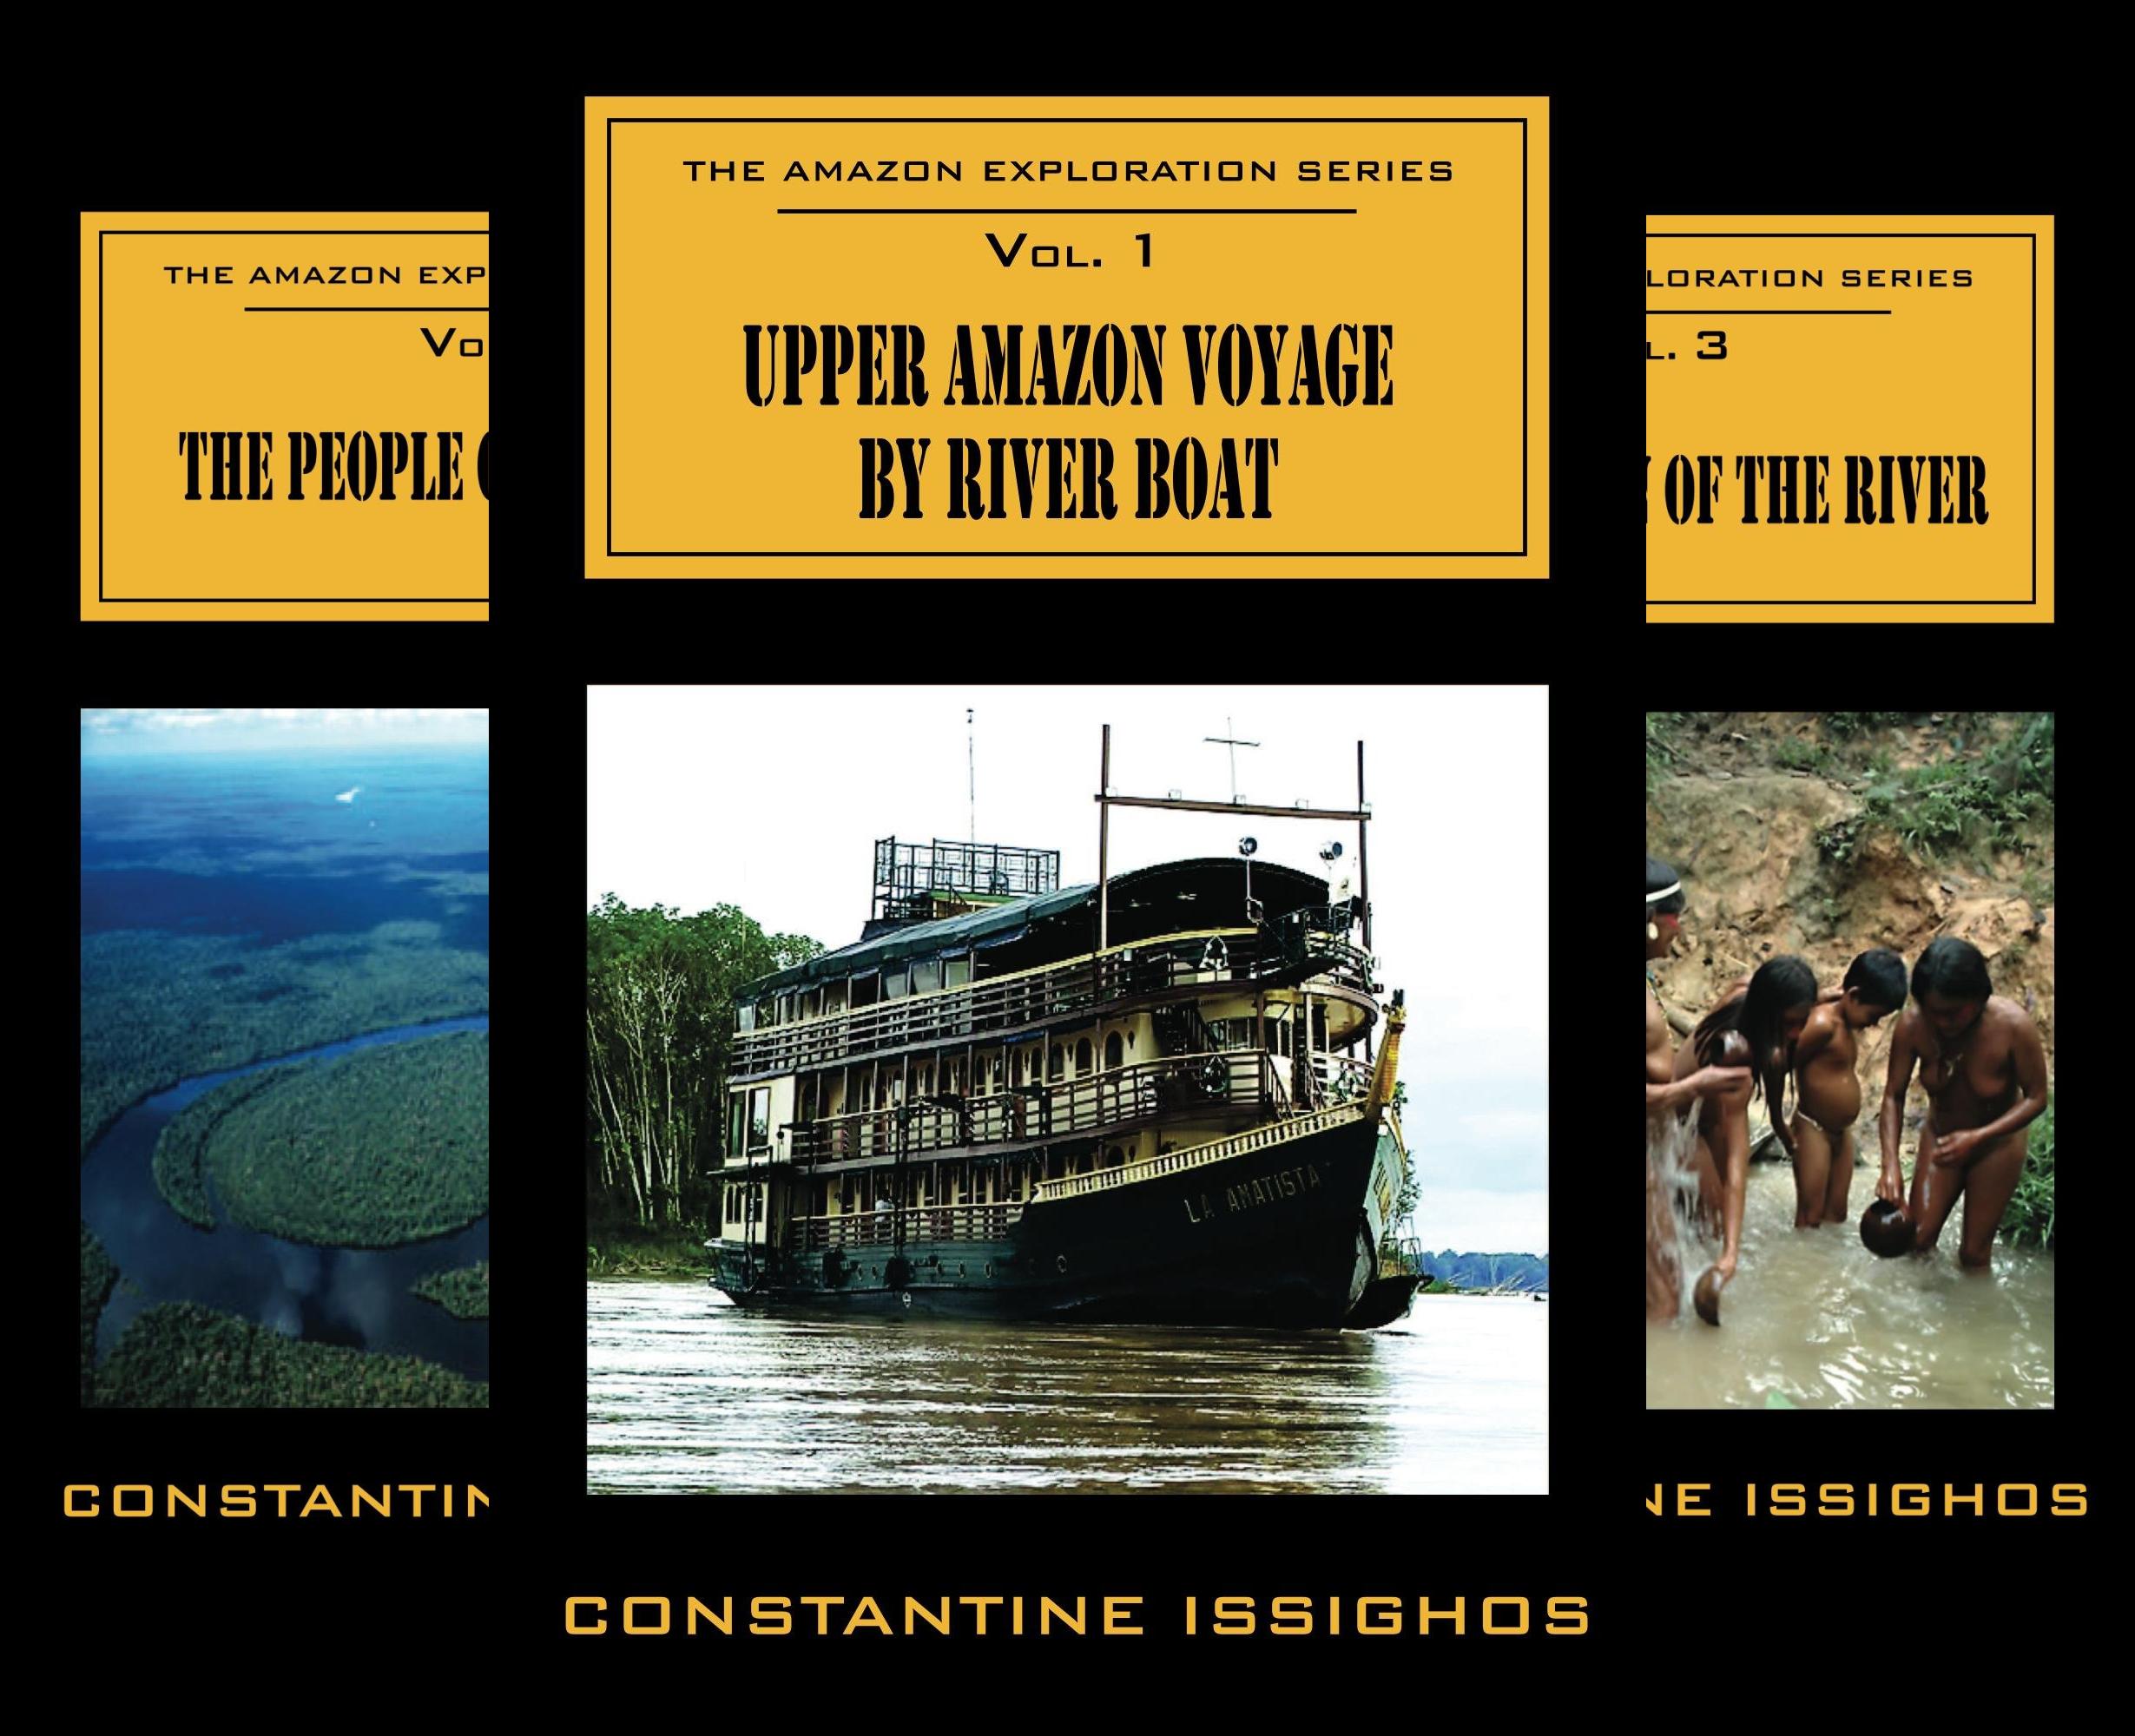 AMAZON EXPLORATION SERIES (20 Book Series)